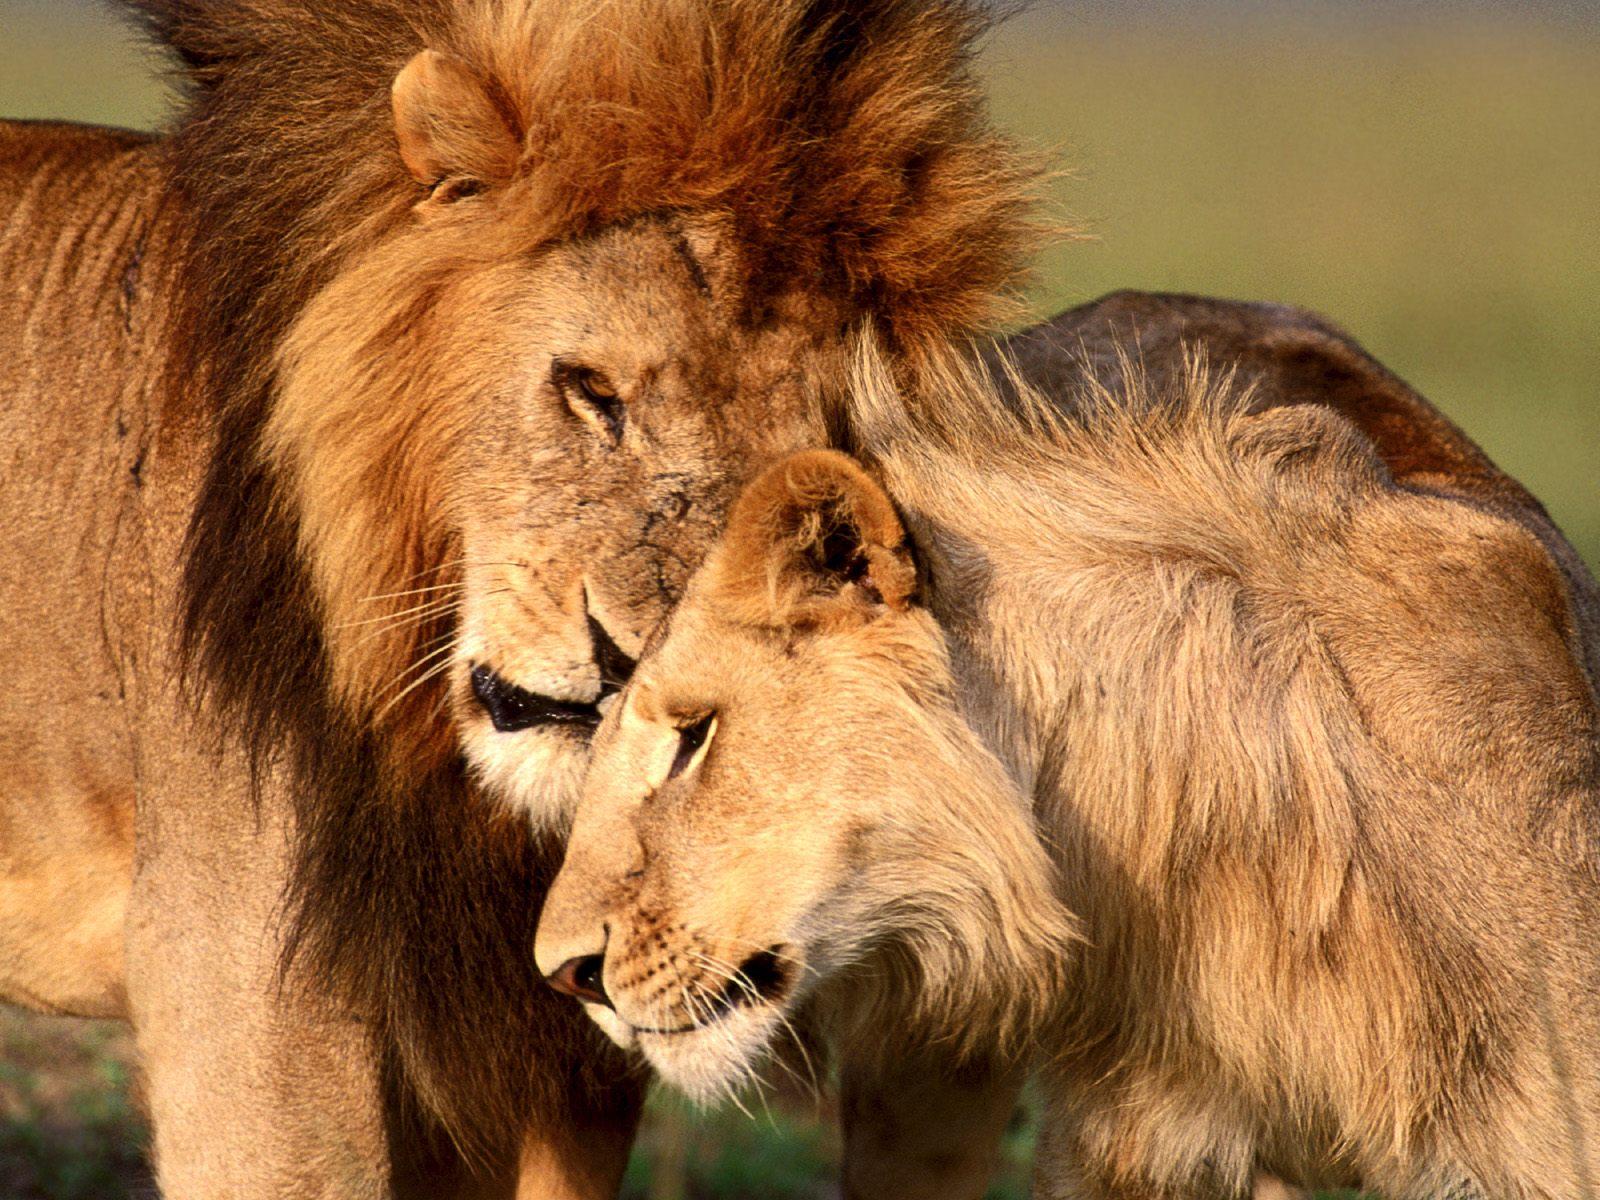 Lion wallpapers for desktop funny animal - Lion wallpaper ...